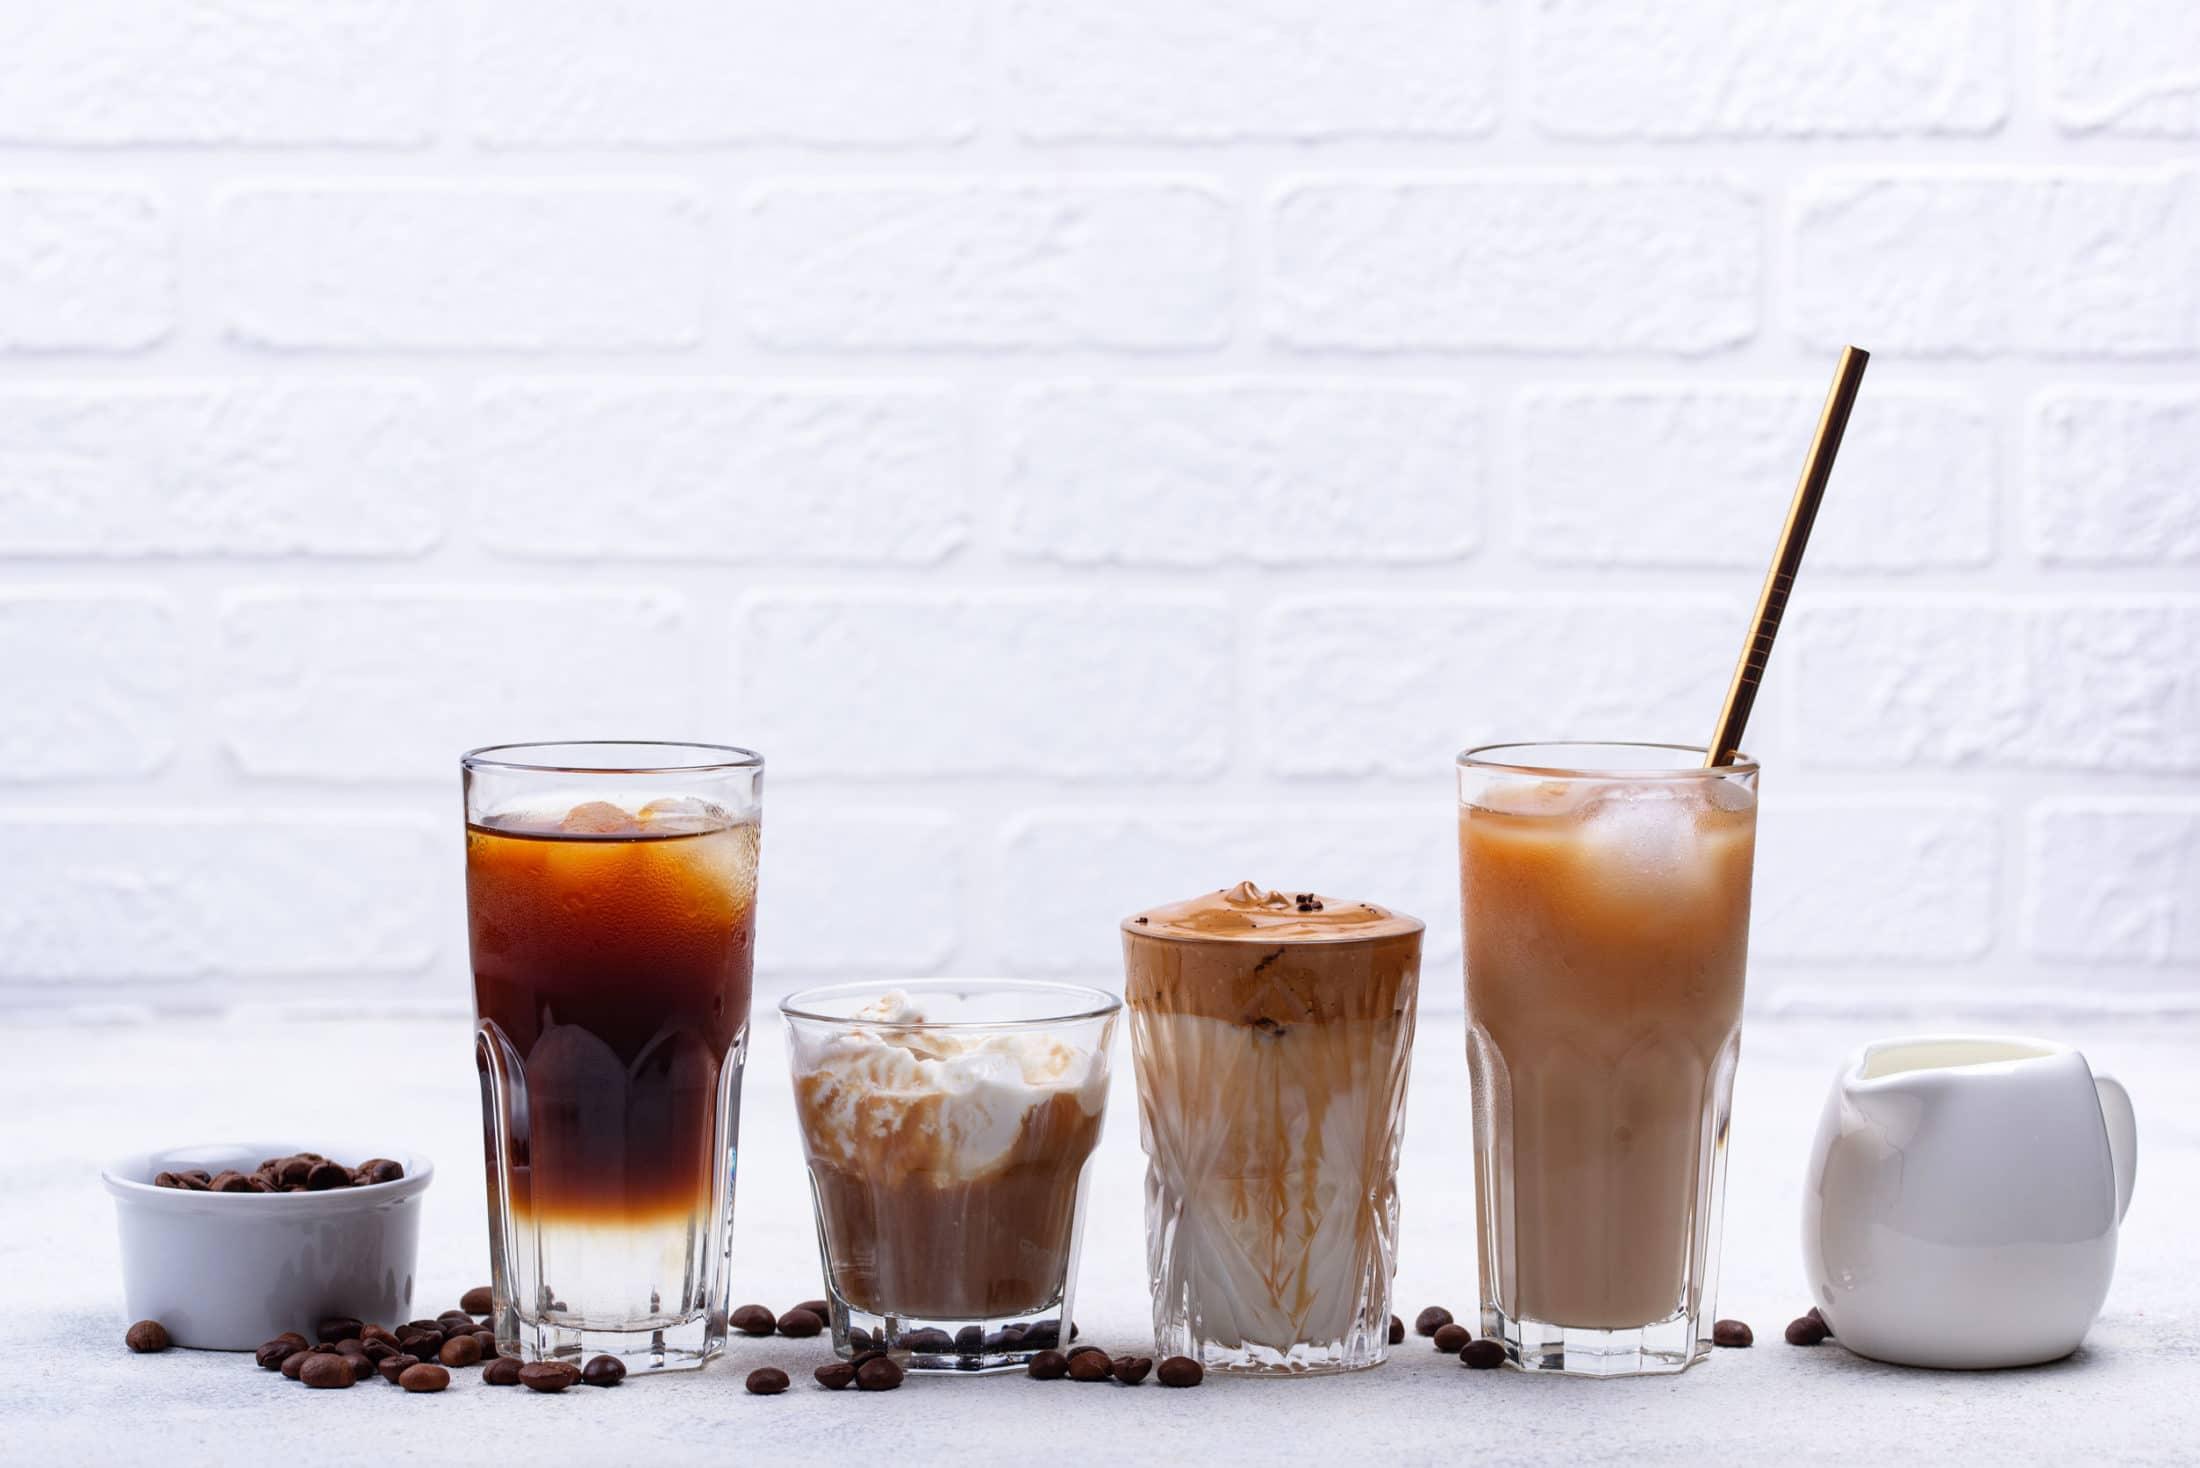 Így készít espresso tonicot és cold brew-t a Madal - Dining Guide